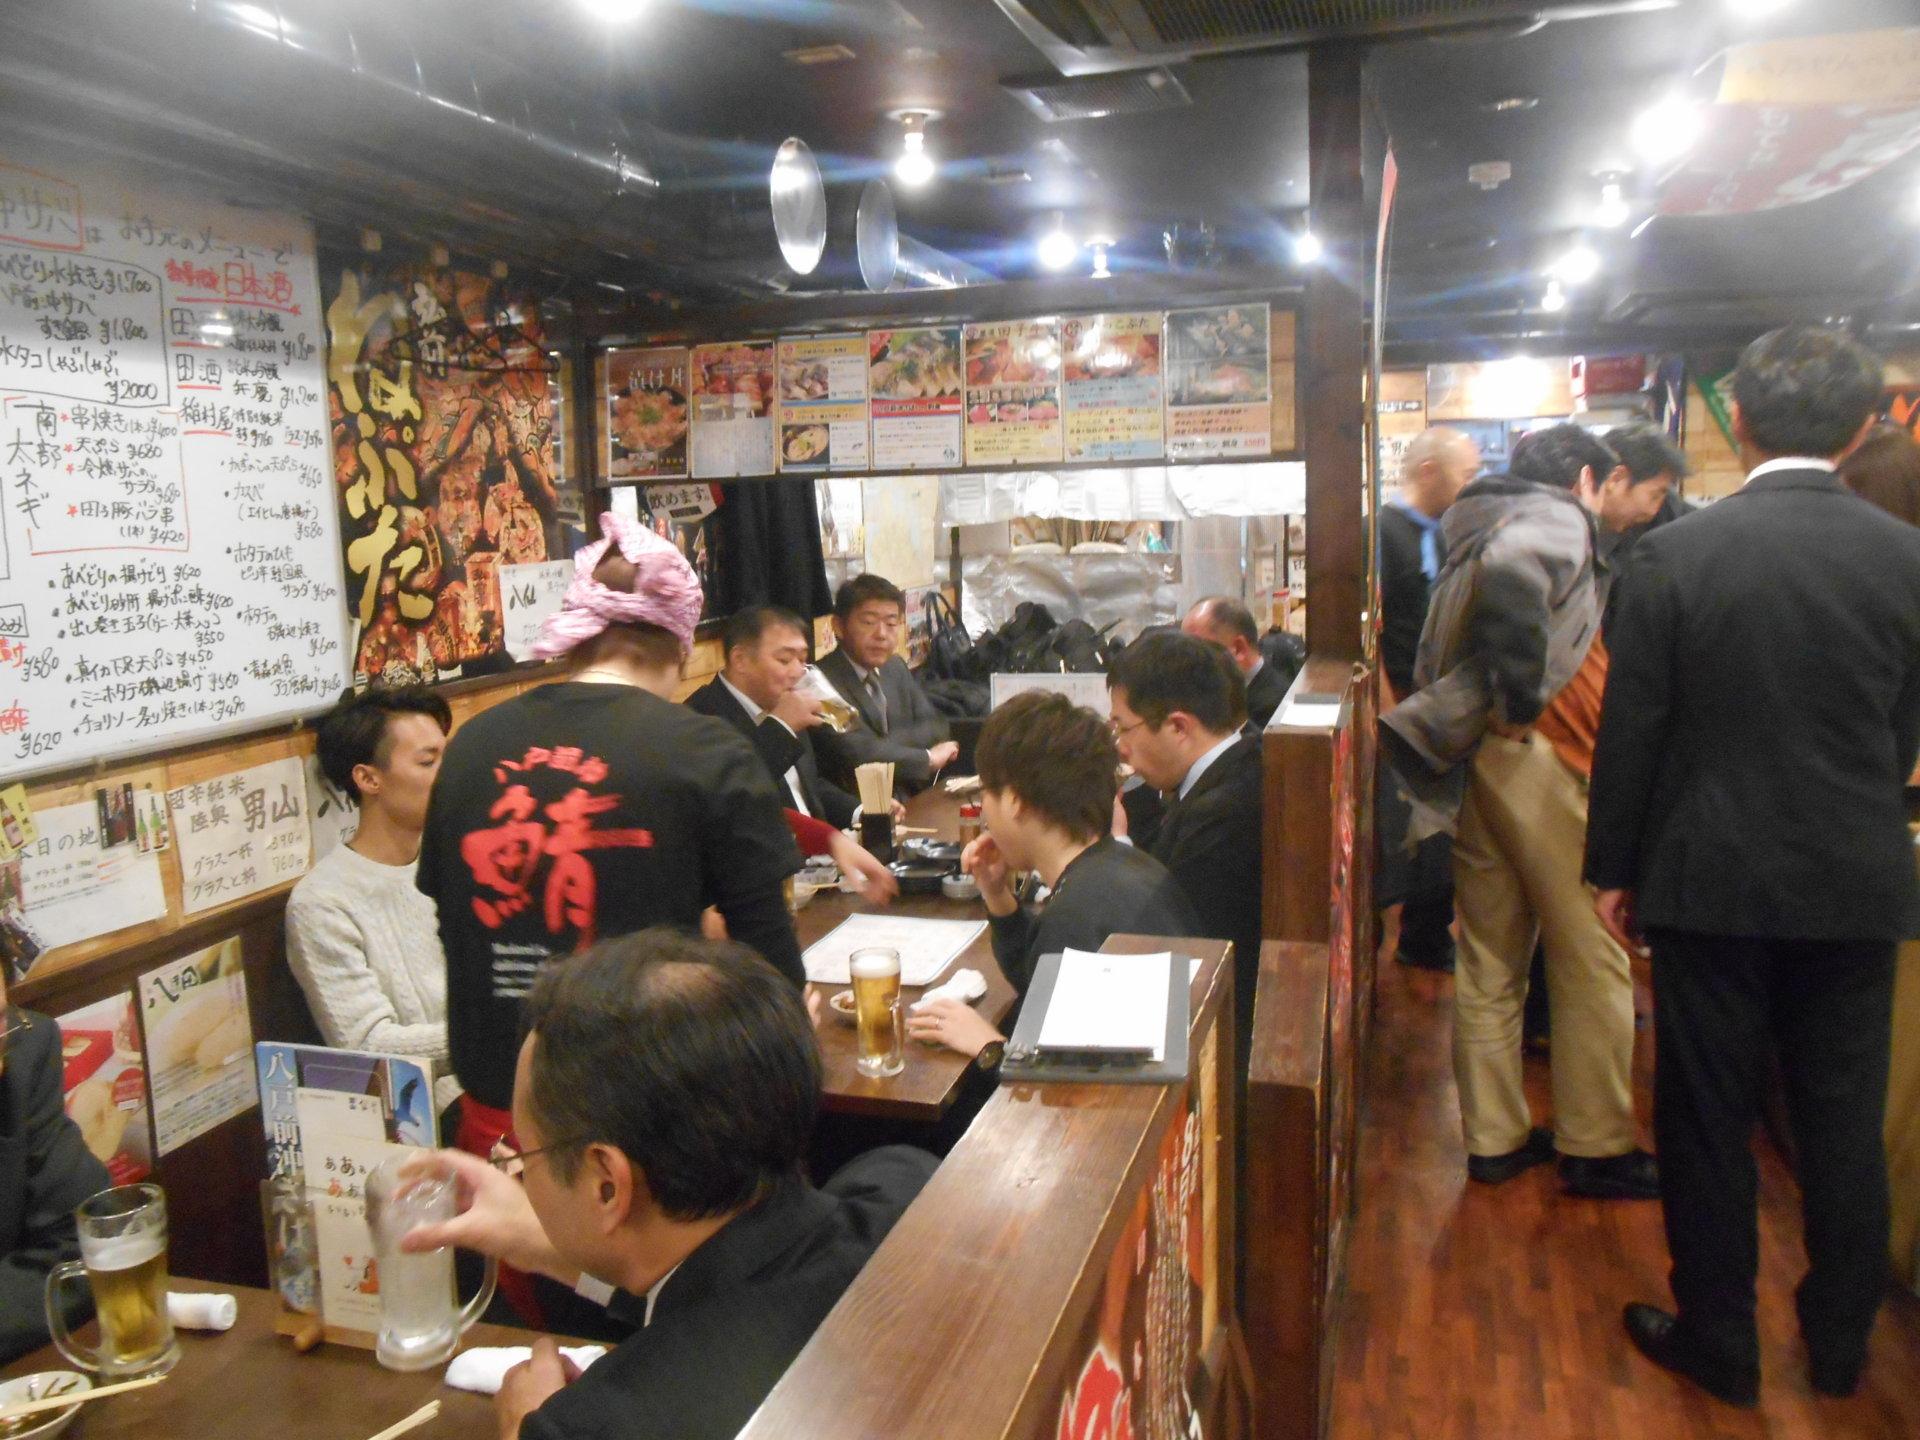 DSCN0594 1920x1440 - 2015年12月21日(月) AOsuki忘年会開催しました。